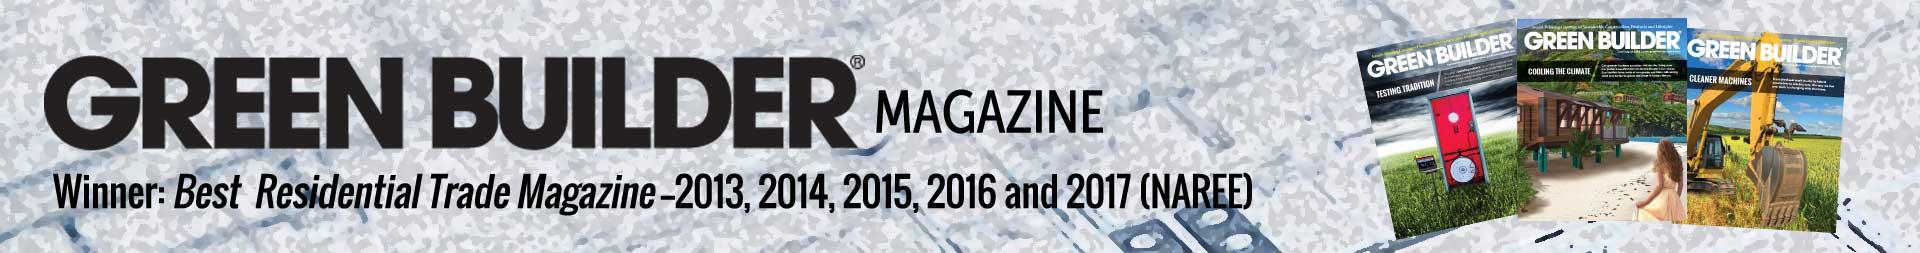 GB-Magazine-Banner.jpg